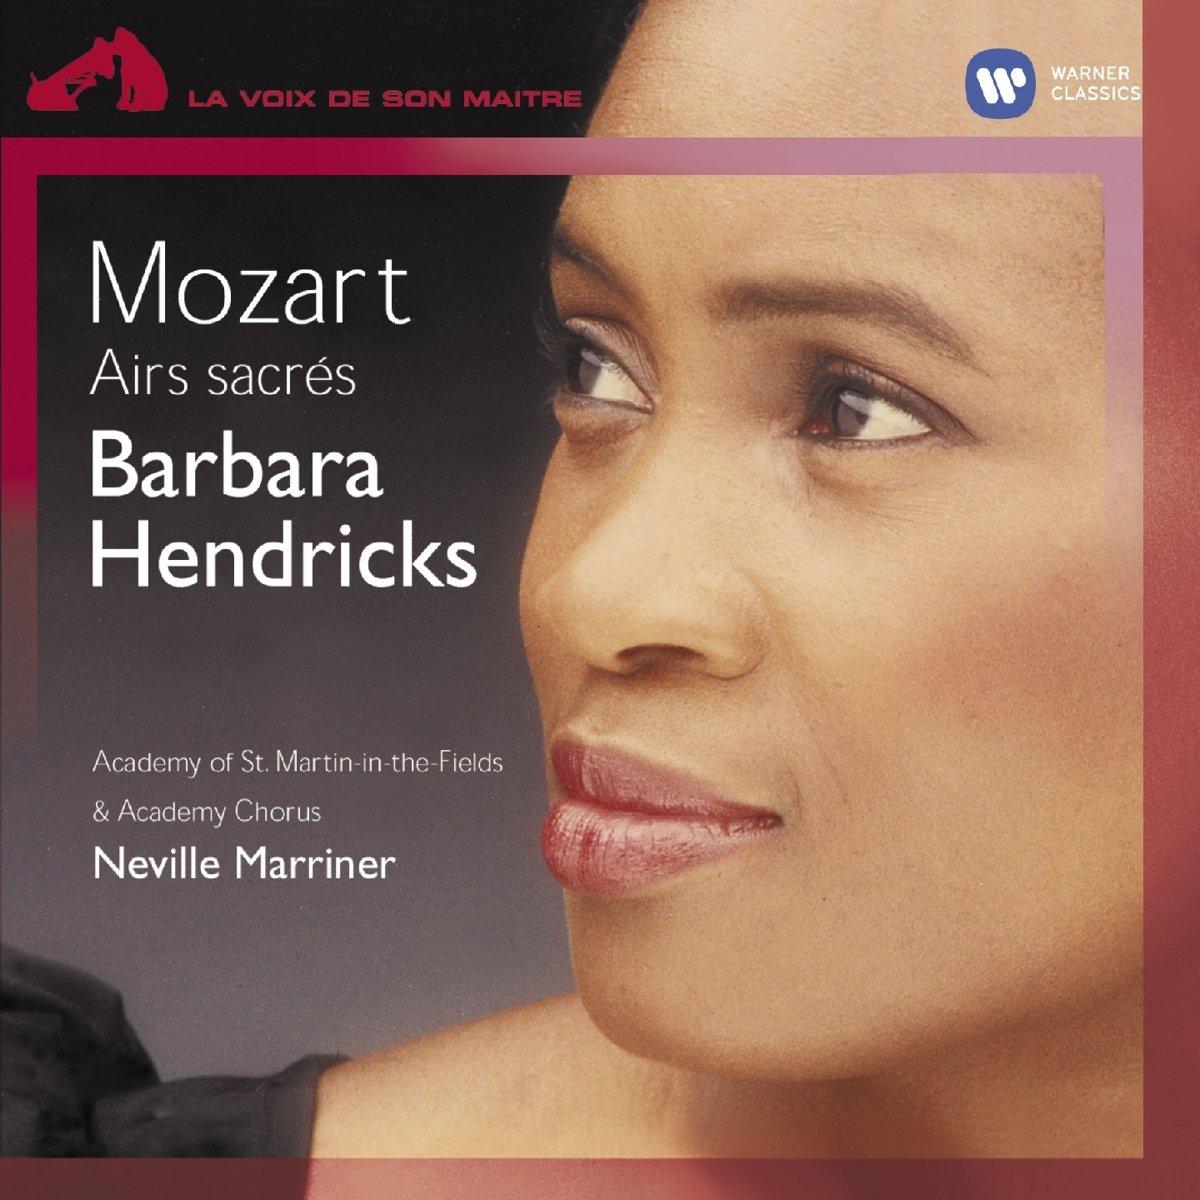 WOLFGANG AMADEUS MOZART - BARBARA HENDRICKS - AIRS SACRES (CD)